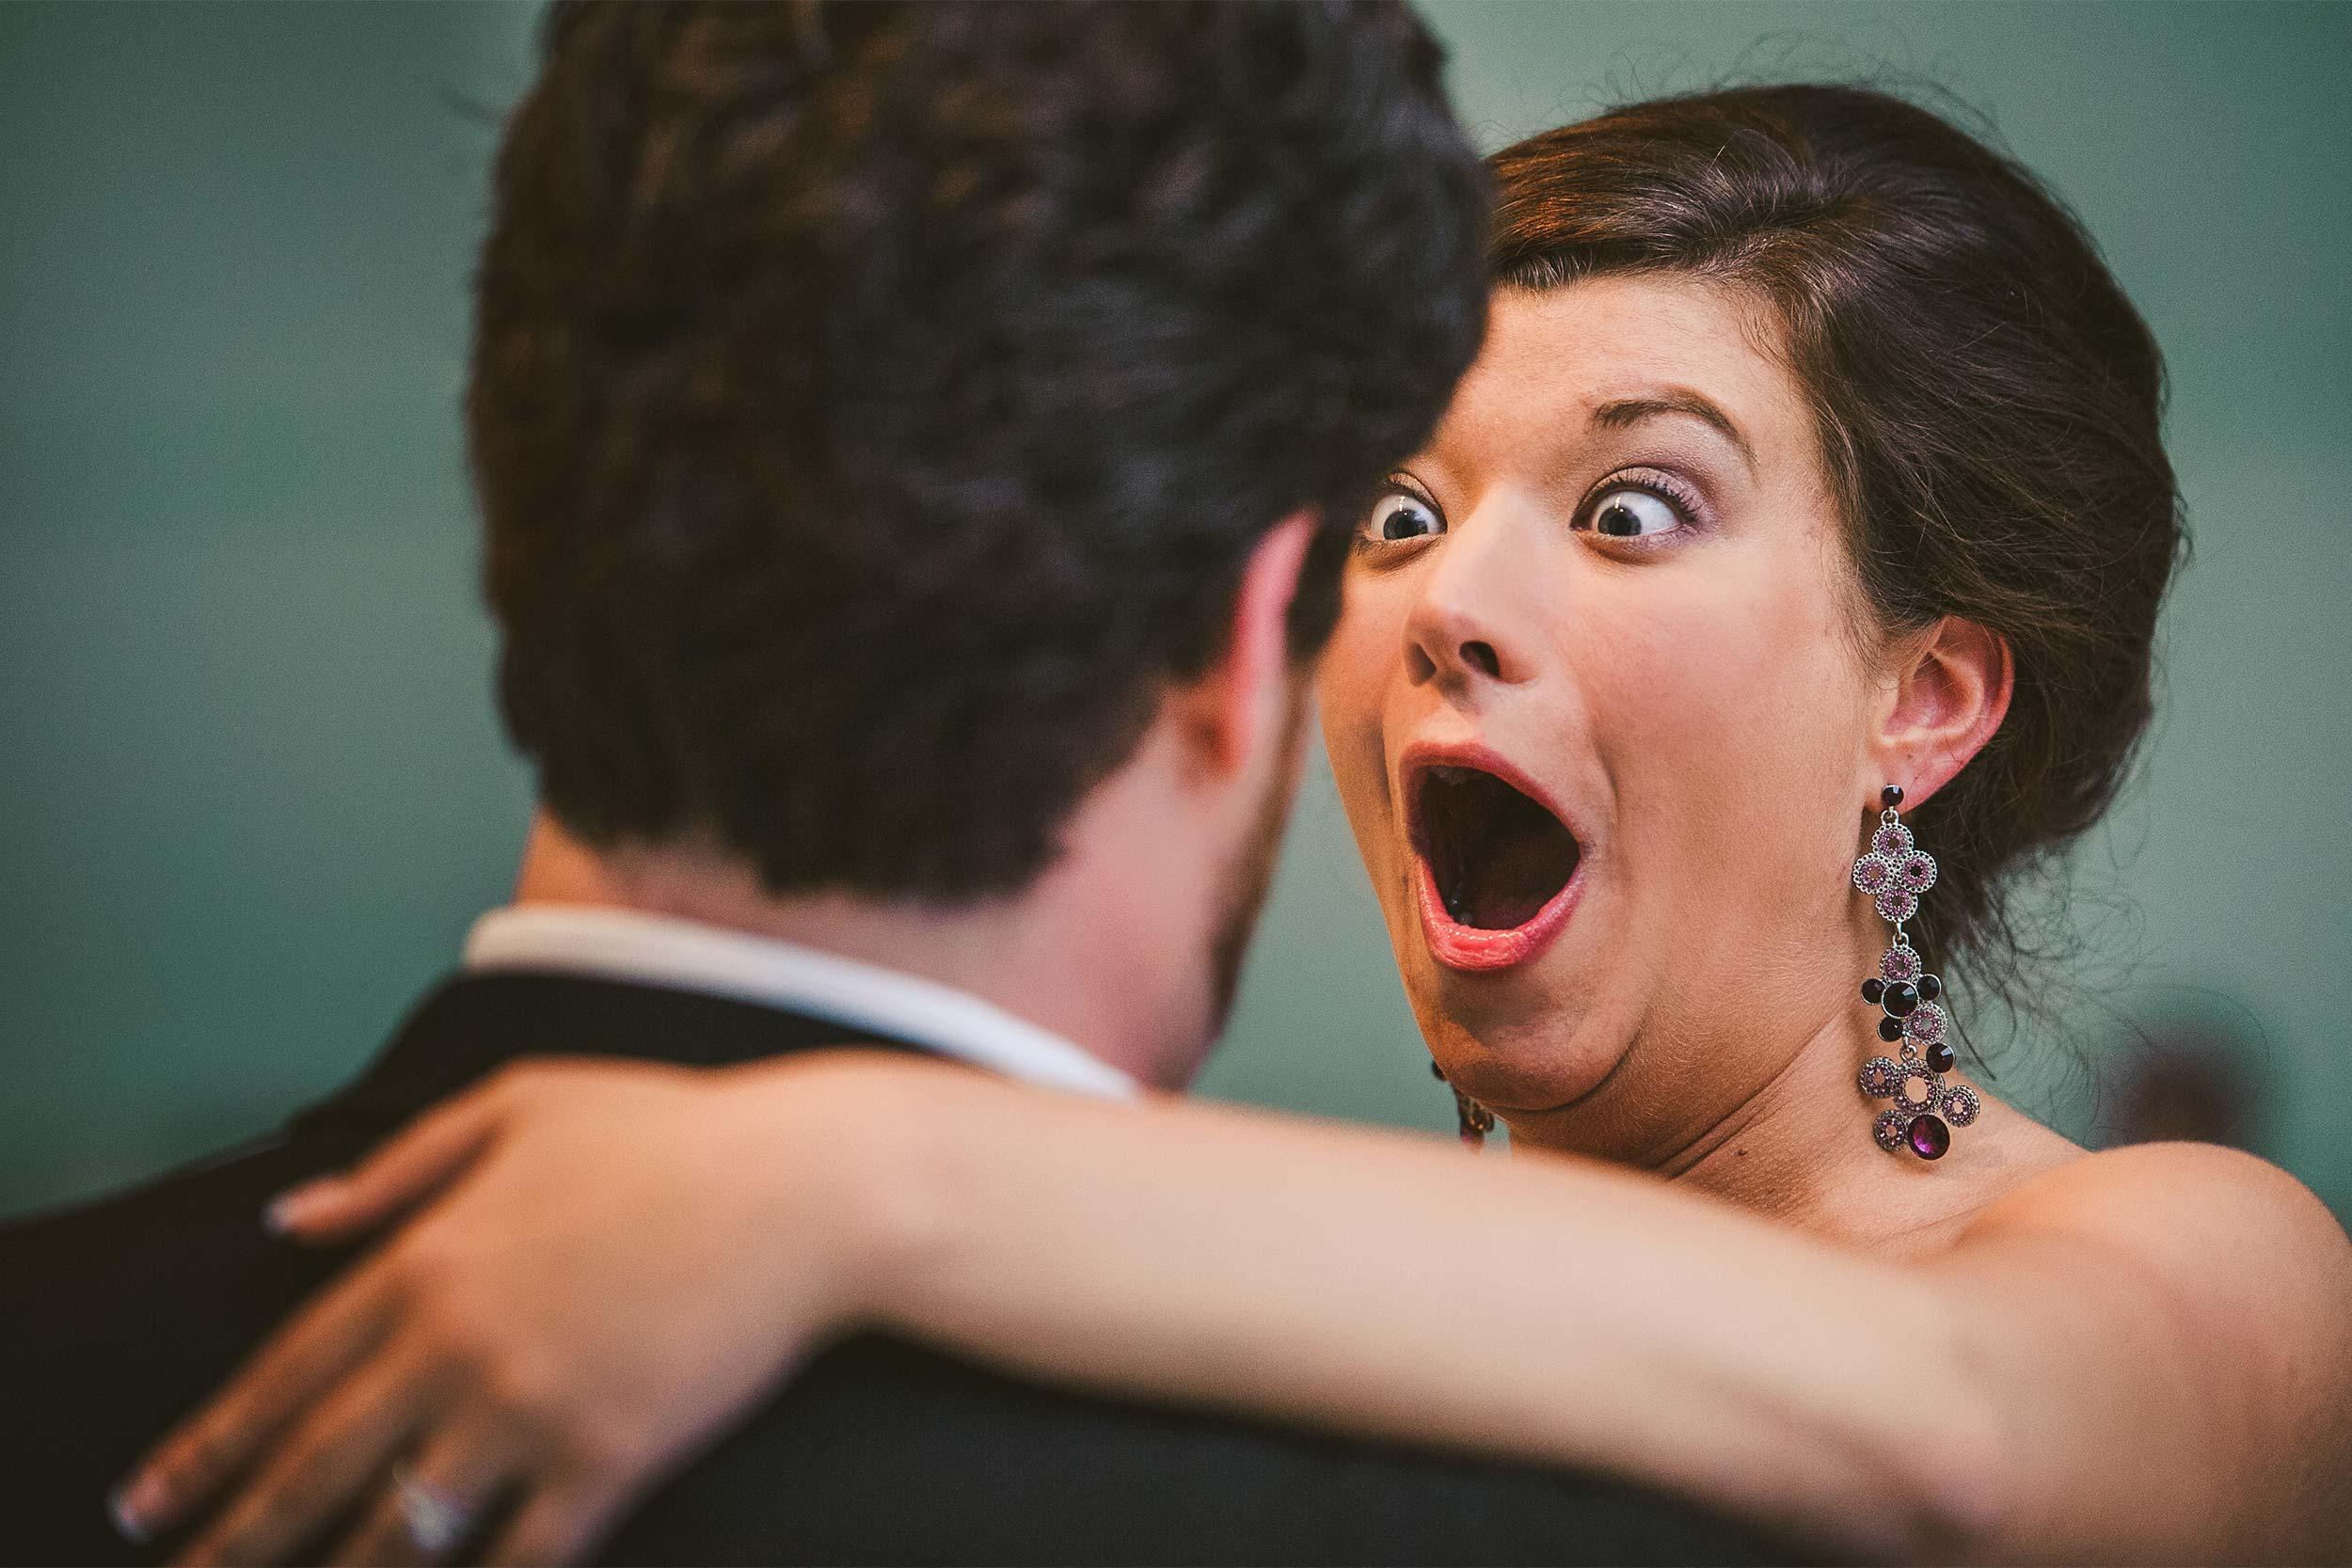 shocked-bride-reaction-shot.jpg